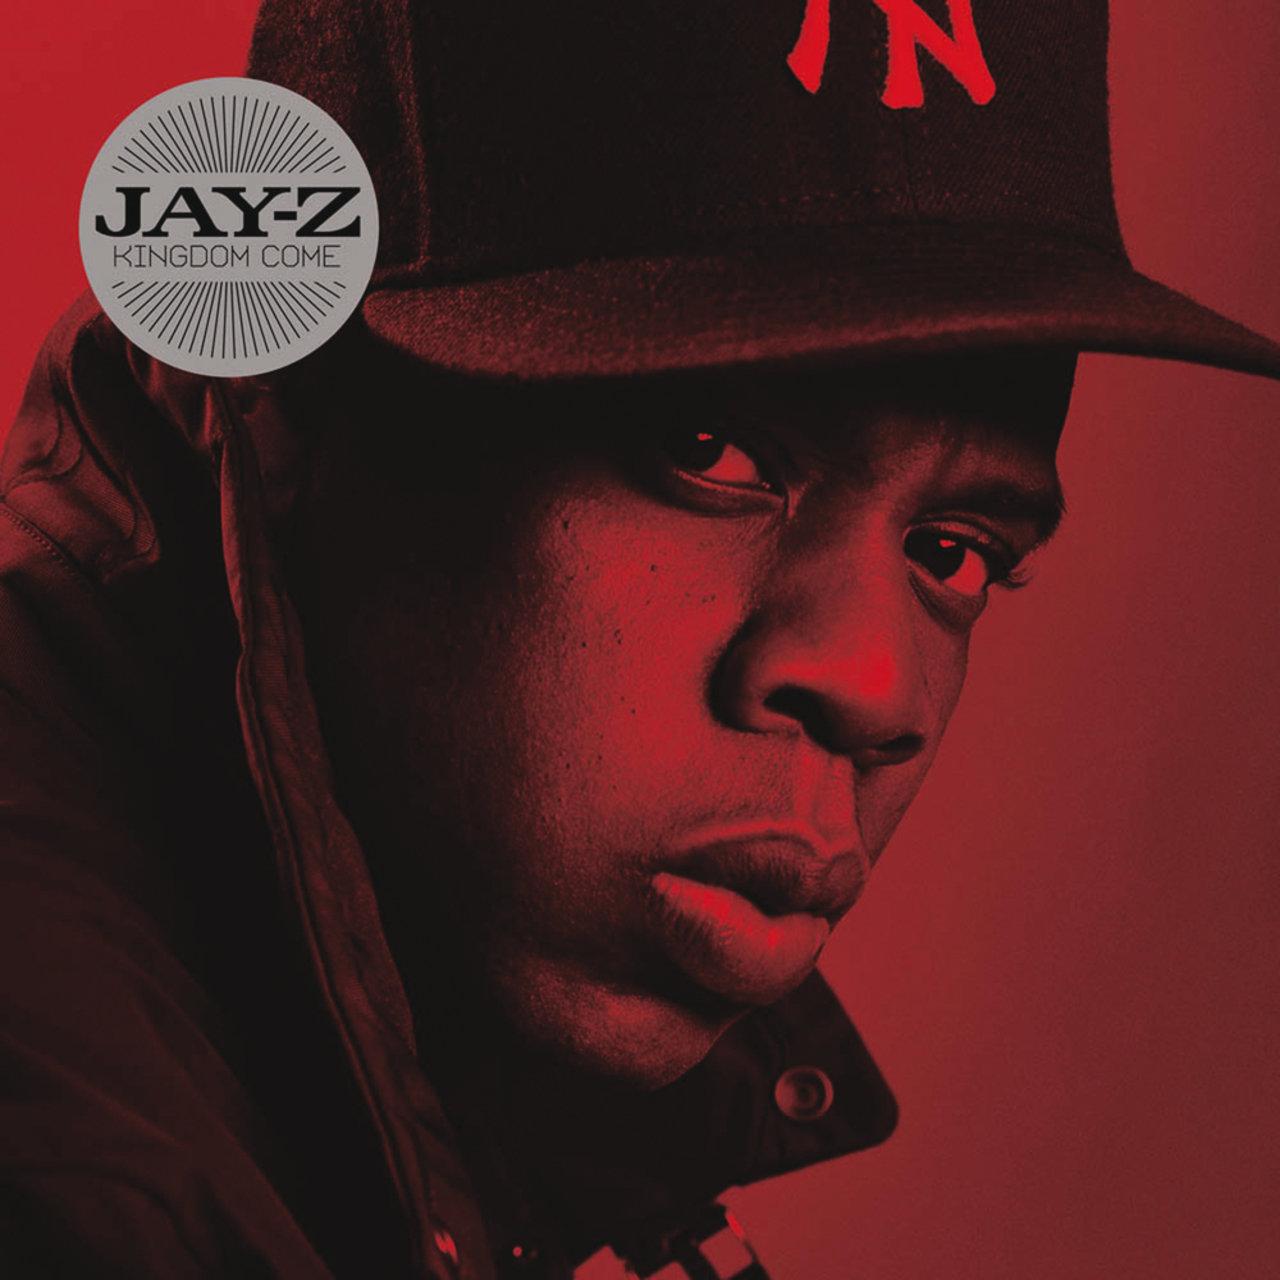 Jay-Z - Kingdom Come (Cover)